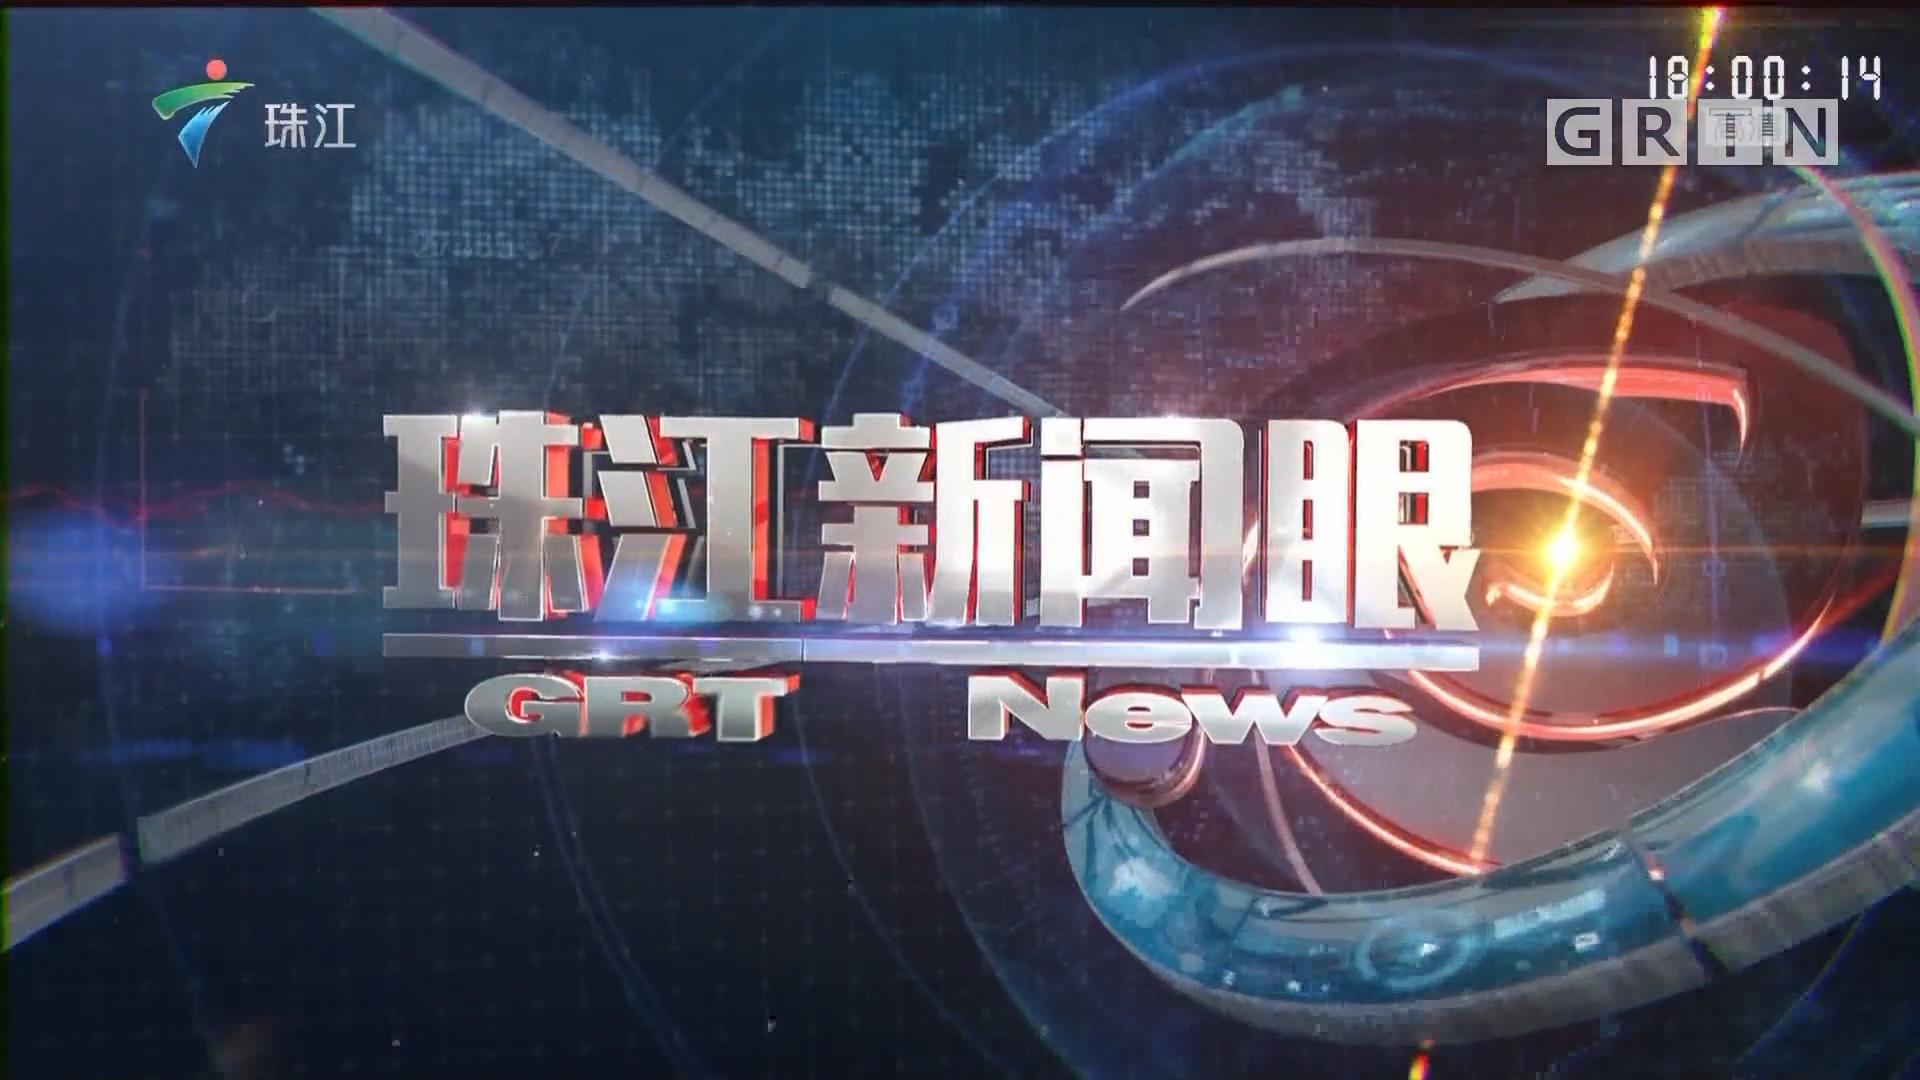 [HD][2019-04-18]珠江新闻眼:珠海:《方案》发布引关注 旅游业界摩拳擦掌